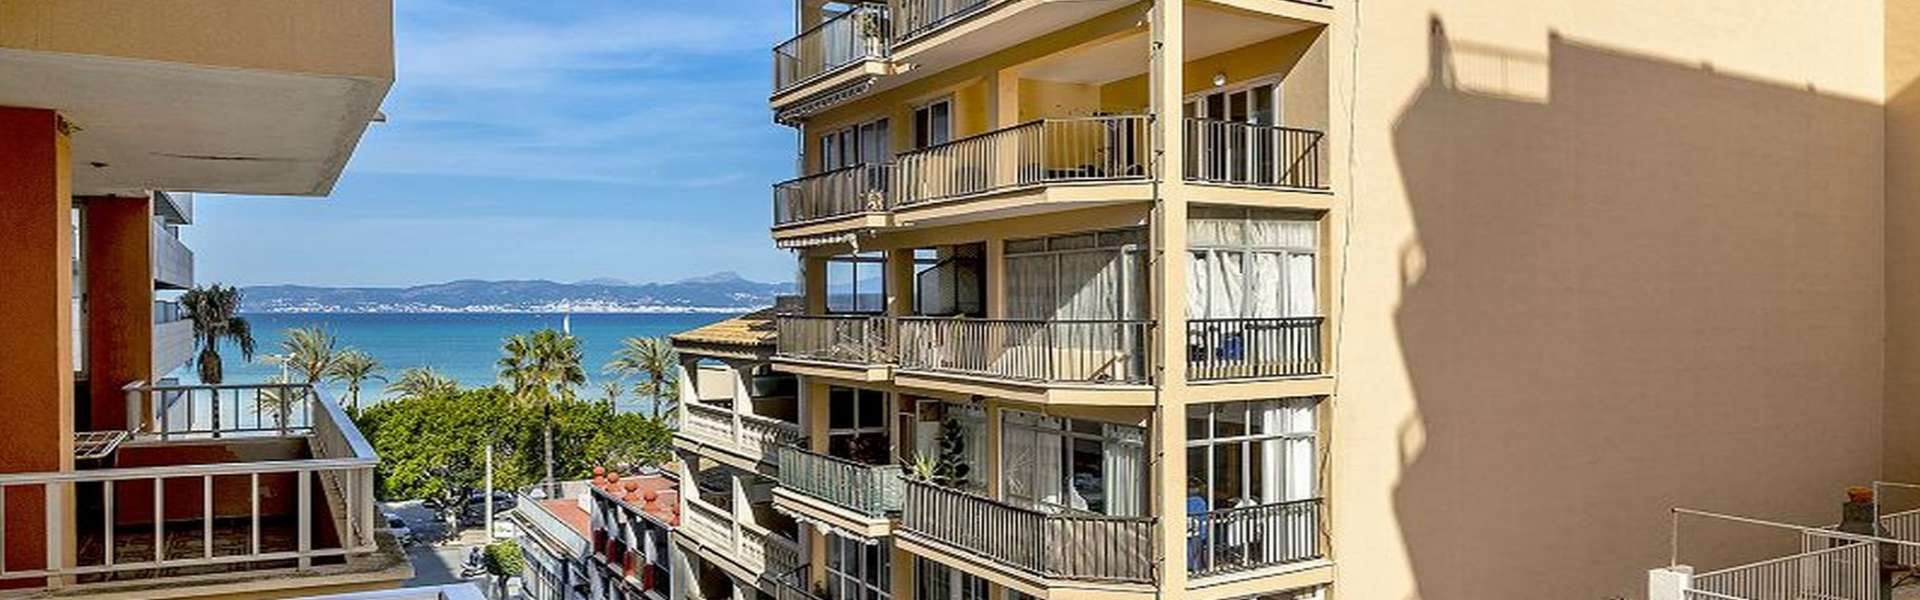 Palma/El Arenal - Apartment in TOP-Lage mit seitlichem Meerblick